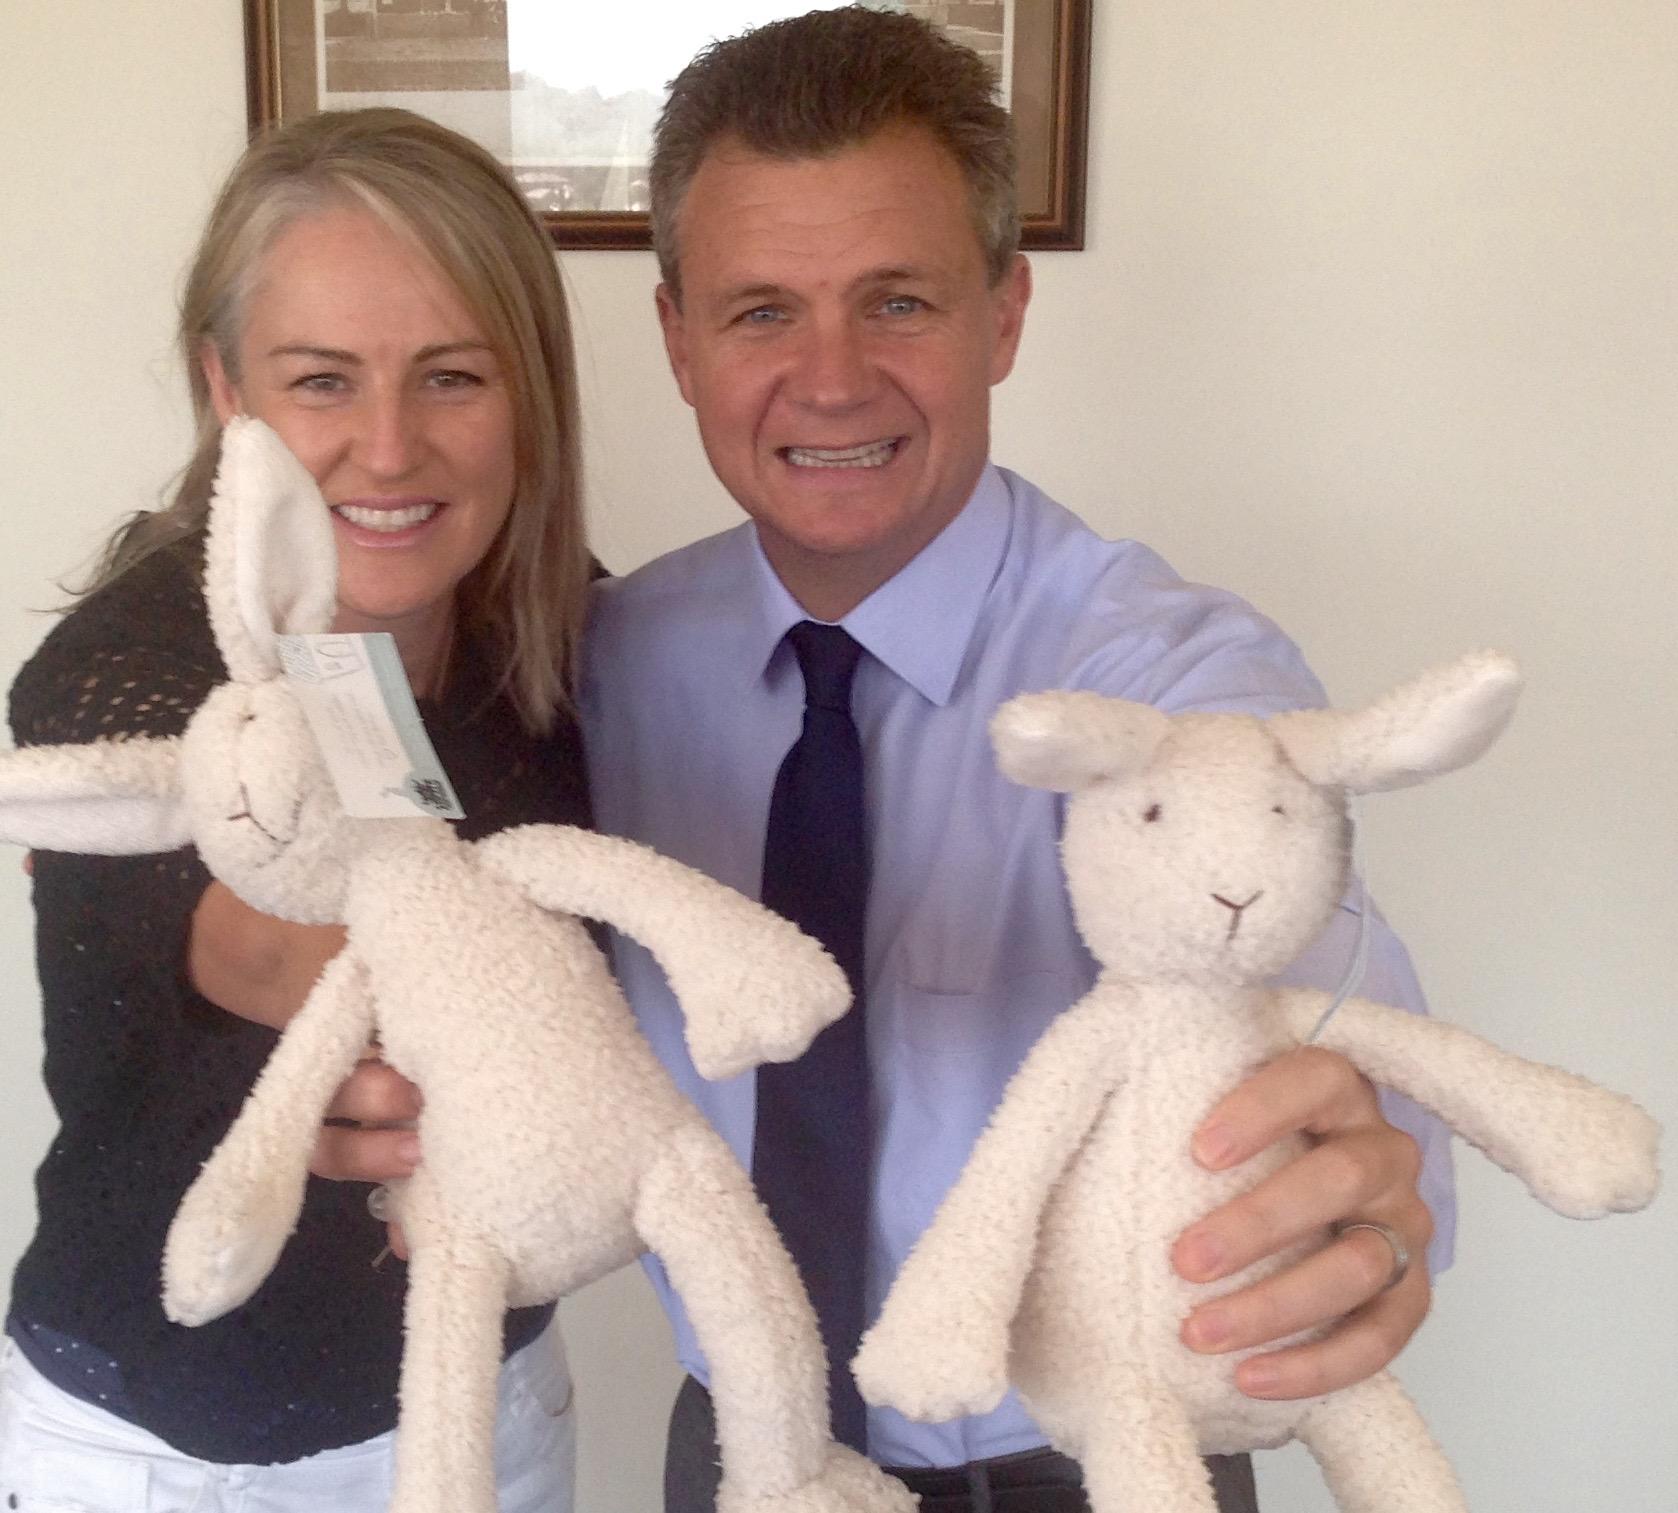 bonnie-the-bunny-matt-thistlethwaite-the-change-angels.jpg